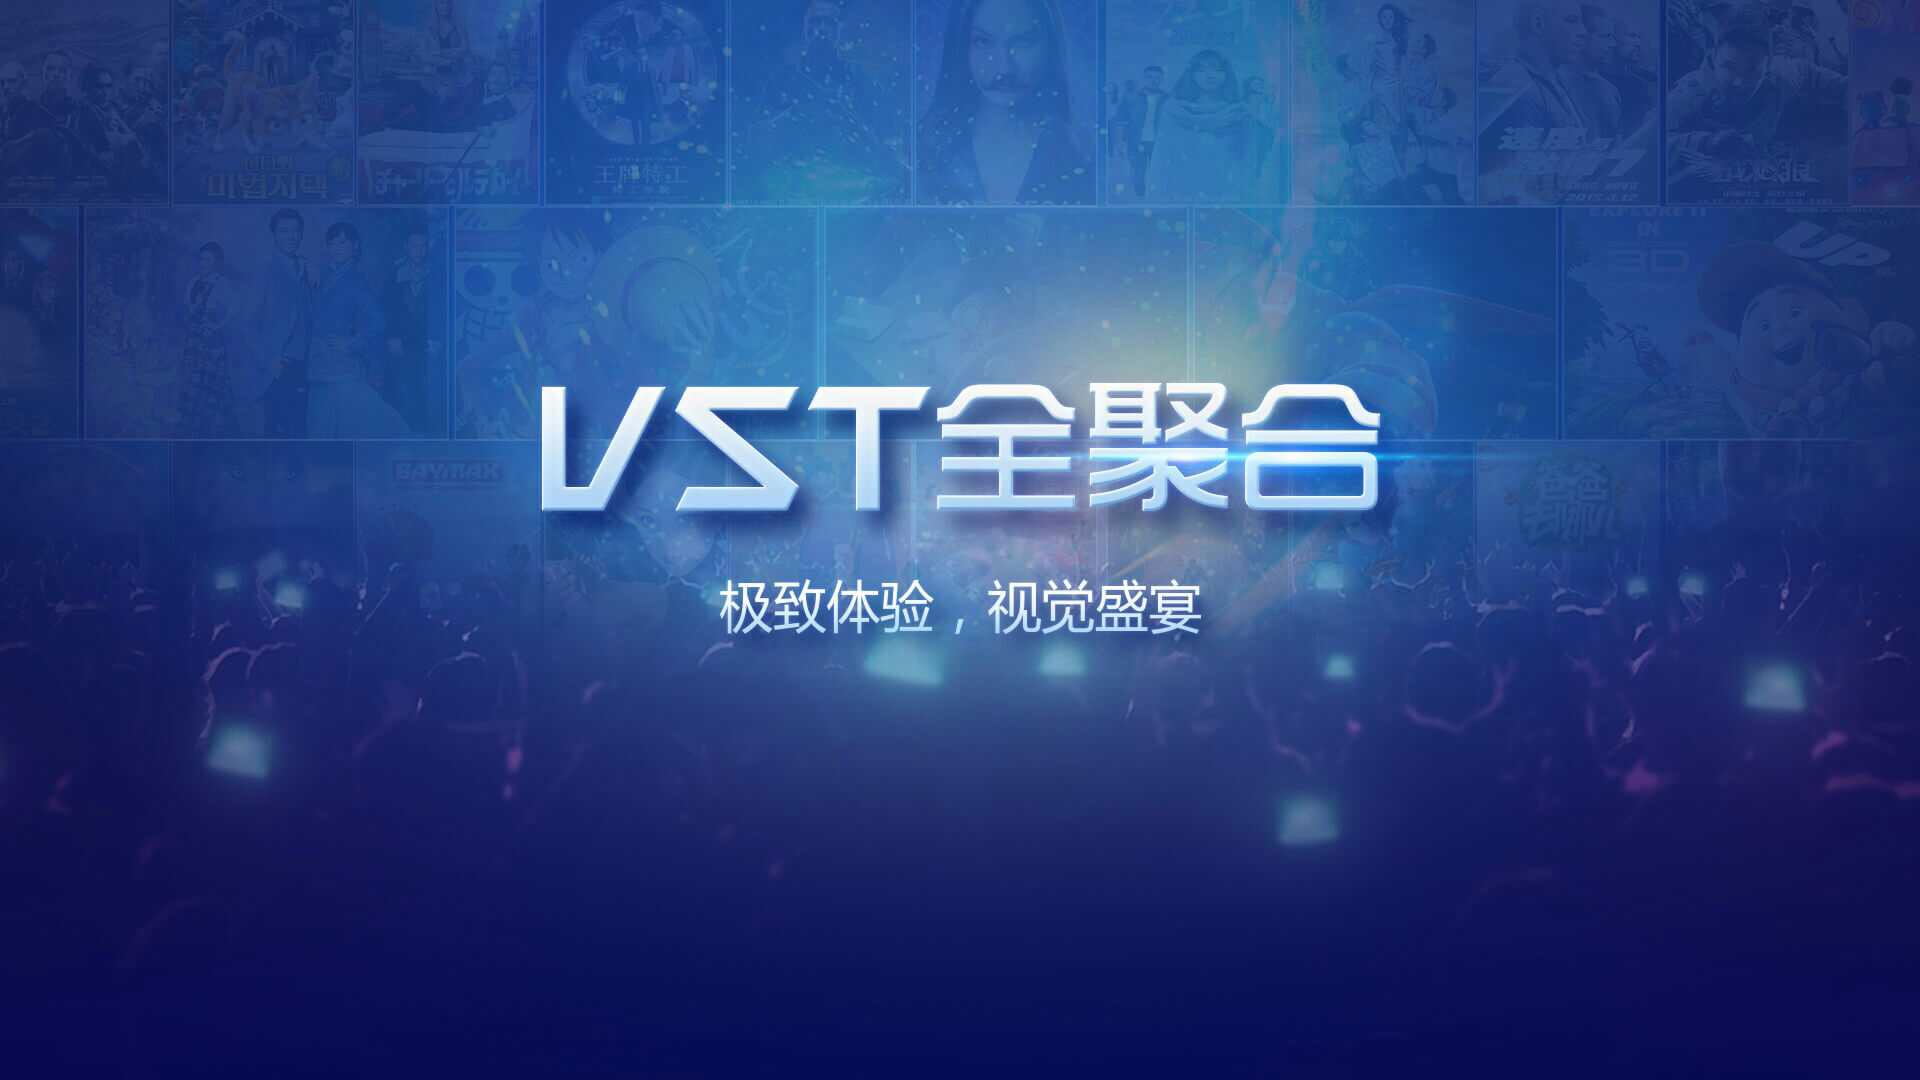 VST全聚合评测 -- 功能好全面的聚合类视频应用